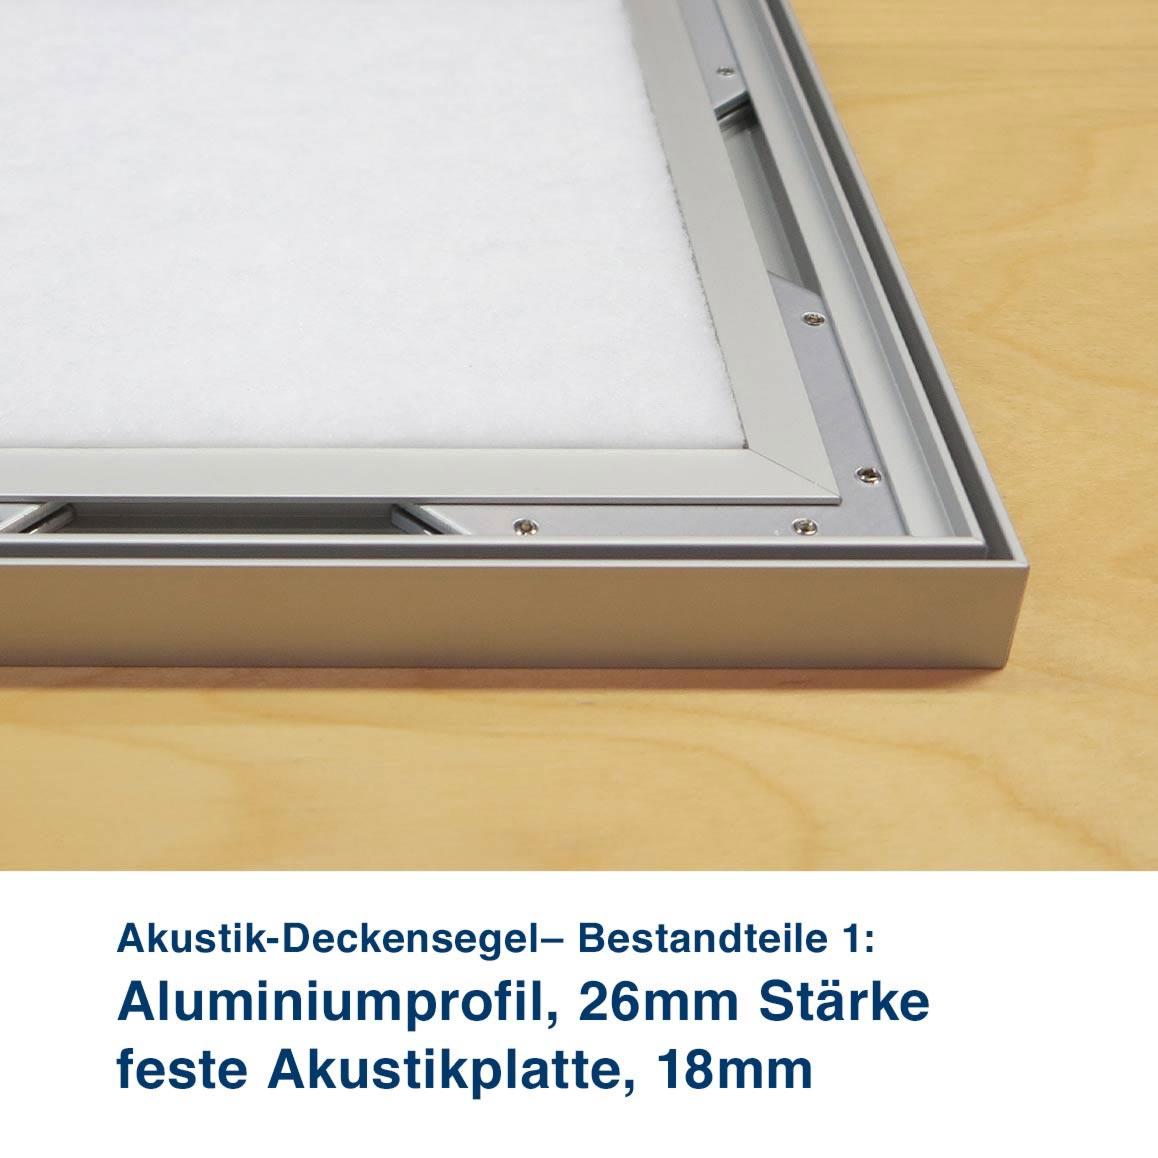 Akustik-Deckensegel– Bestandteile 1:  Aluminiumprofil, 26mm Stärke feste Akustikplatte, 18mm